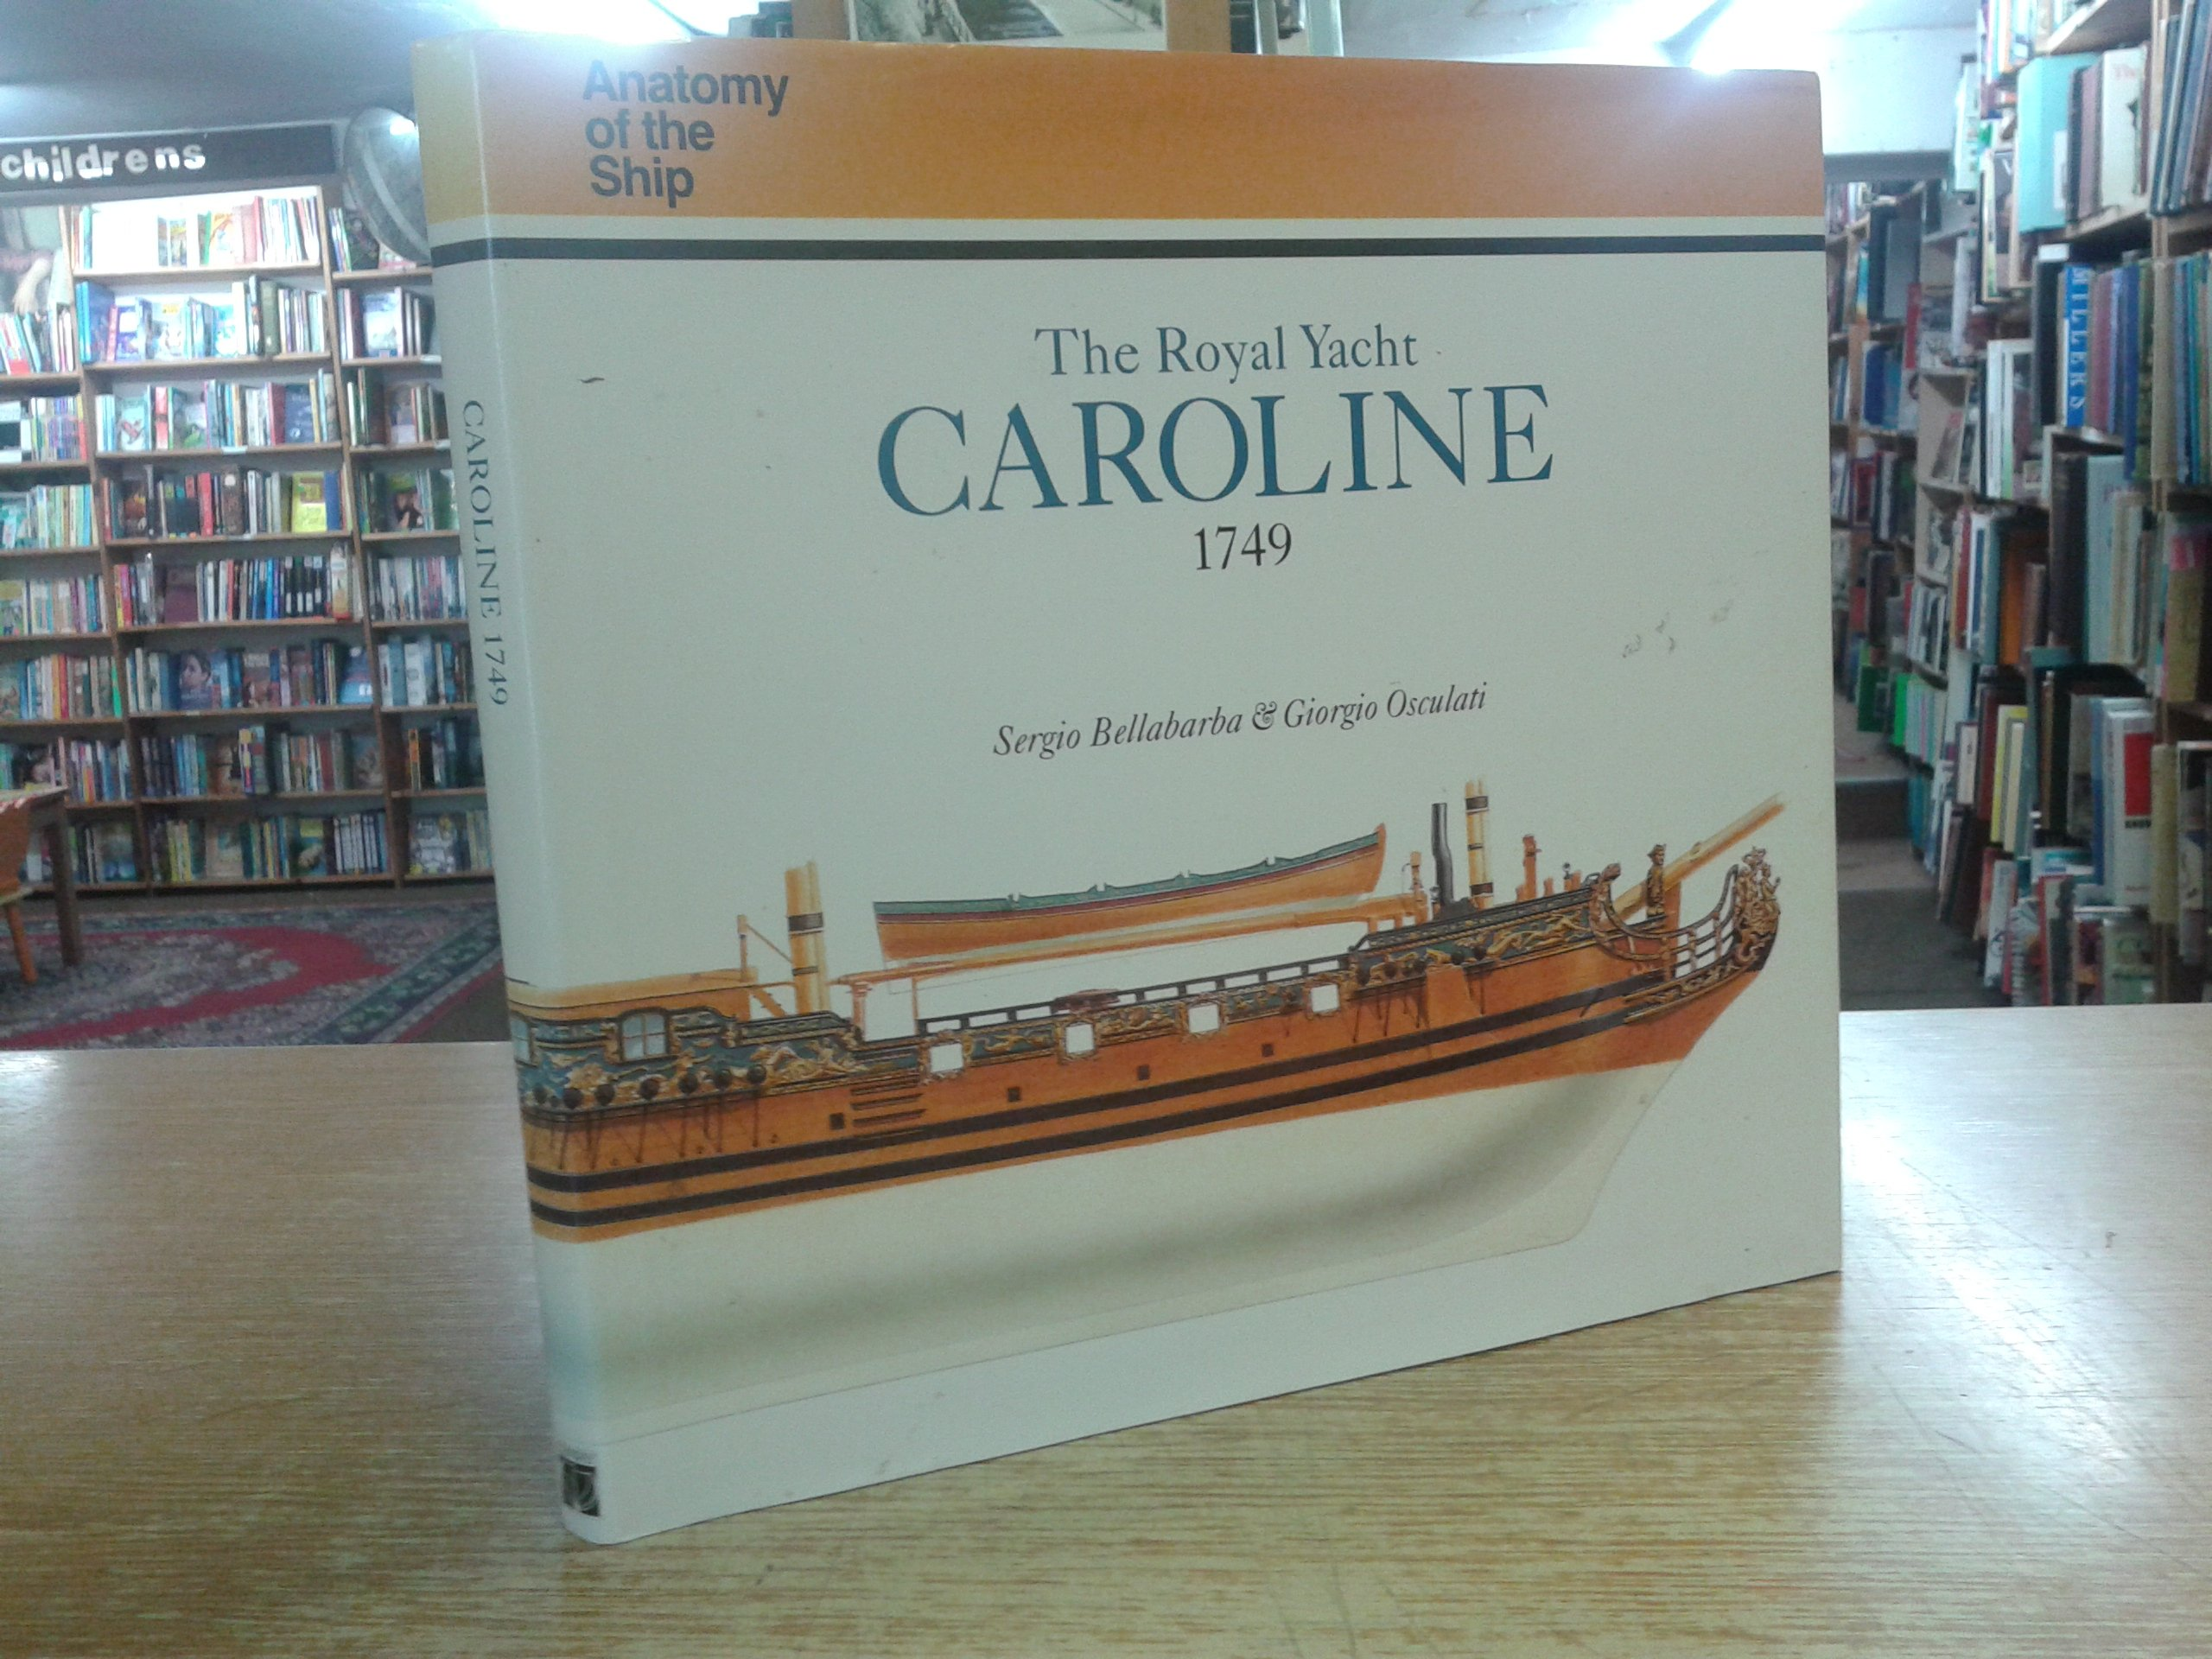 The Royal Yacht Caroline 1749 Anatomy Of The Ship Sergio